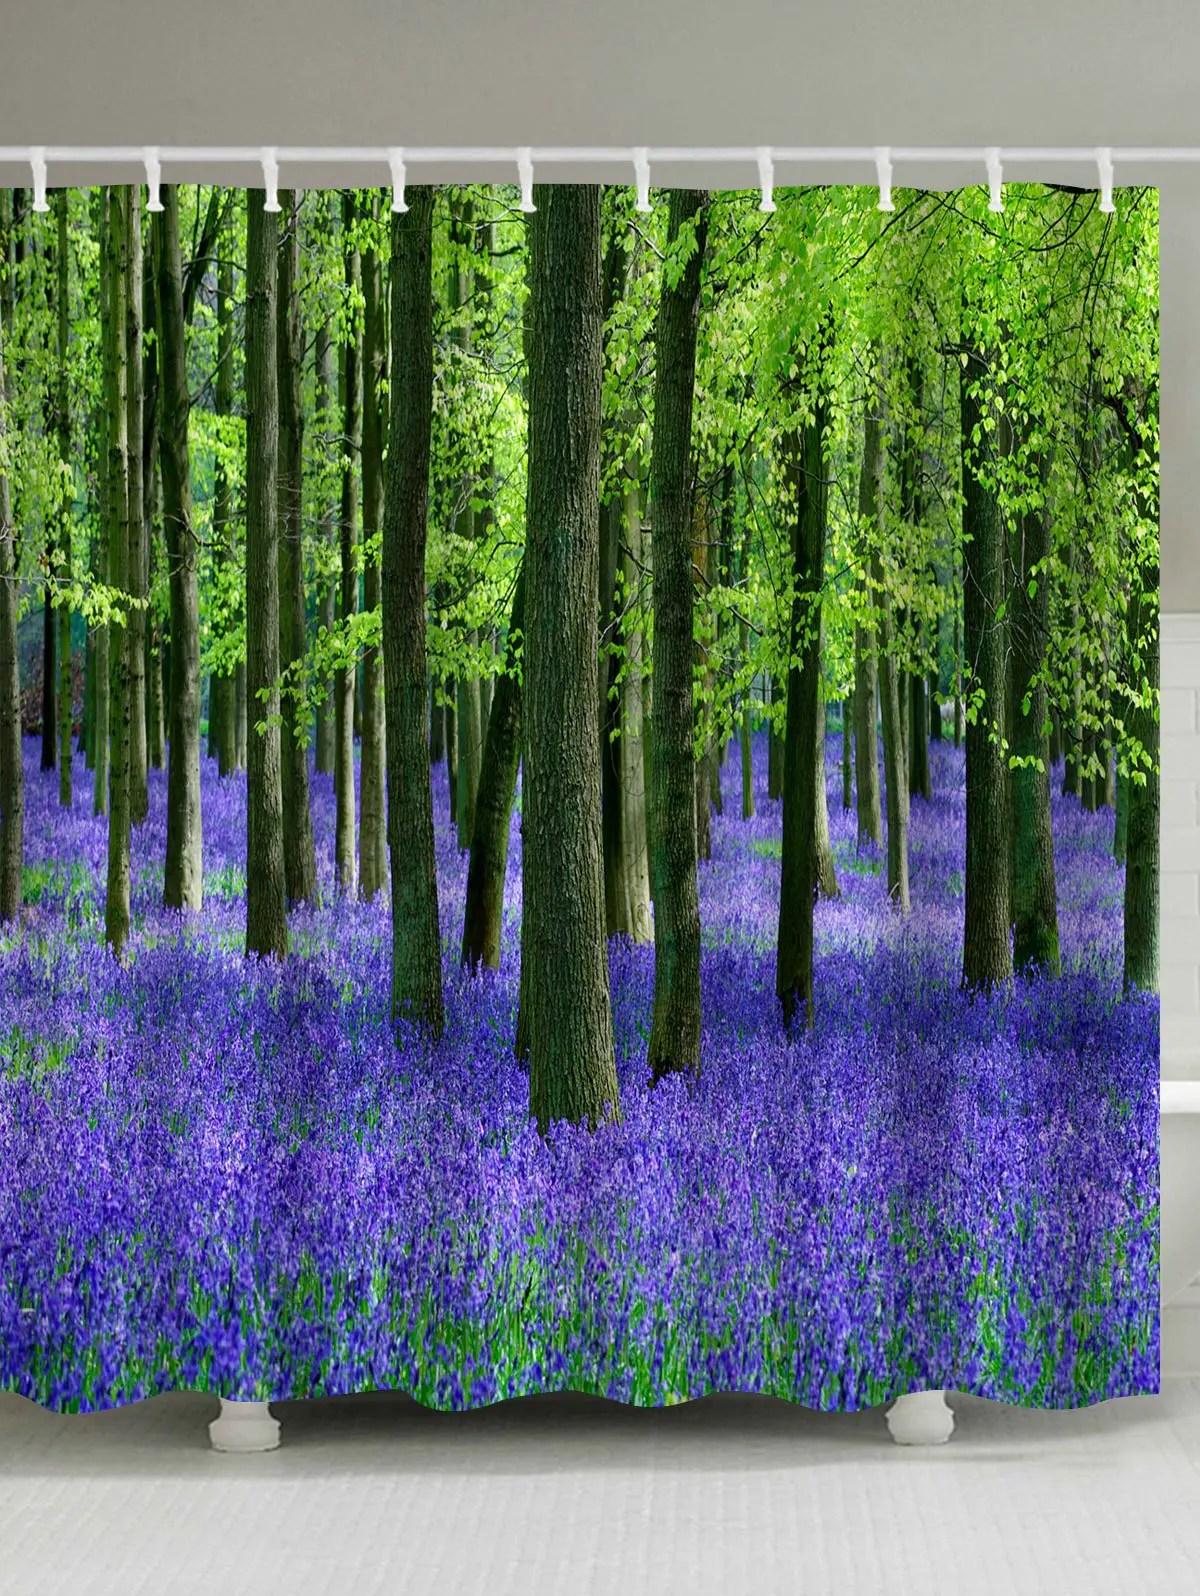 Lavender Forest Print Fabric Waterproof Bathroom Shower Curtain